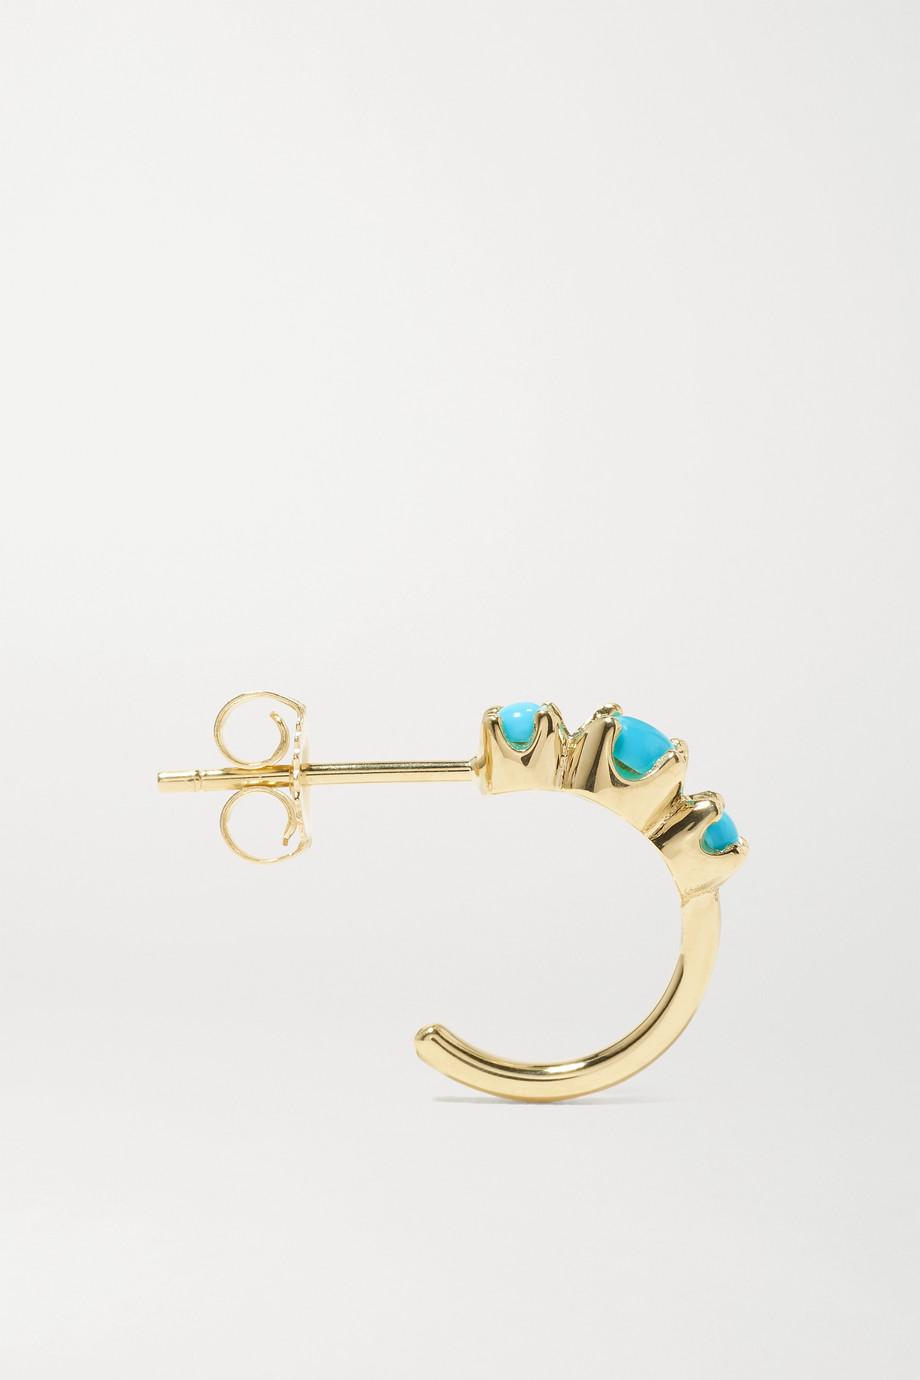 Jennifer Meyer 18-karat gold turquoise hoop earrings